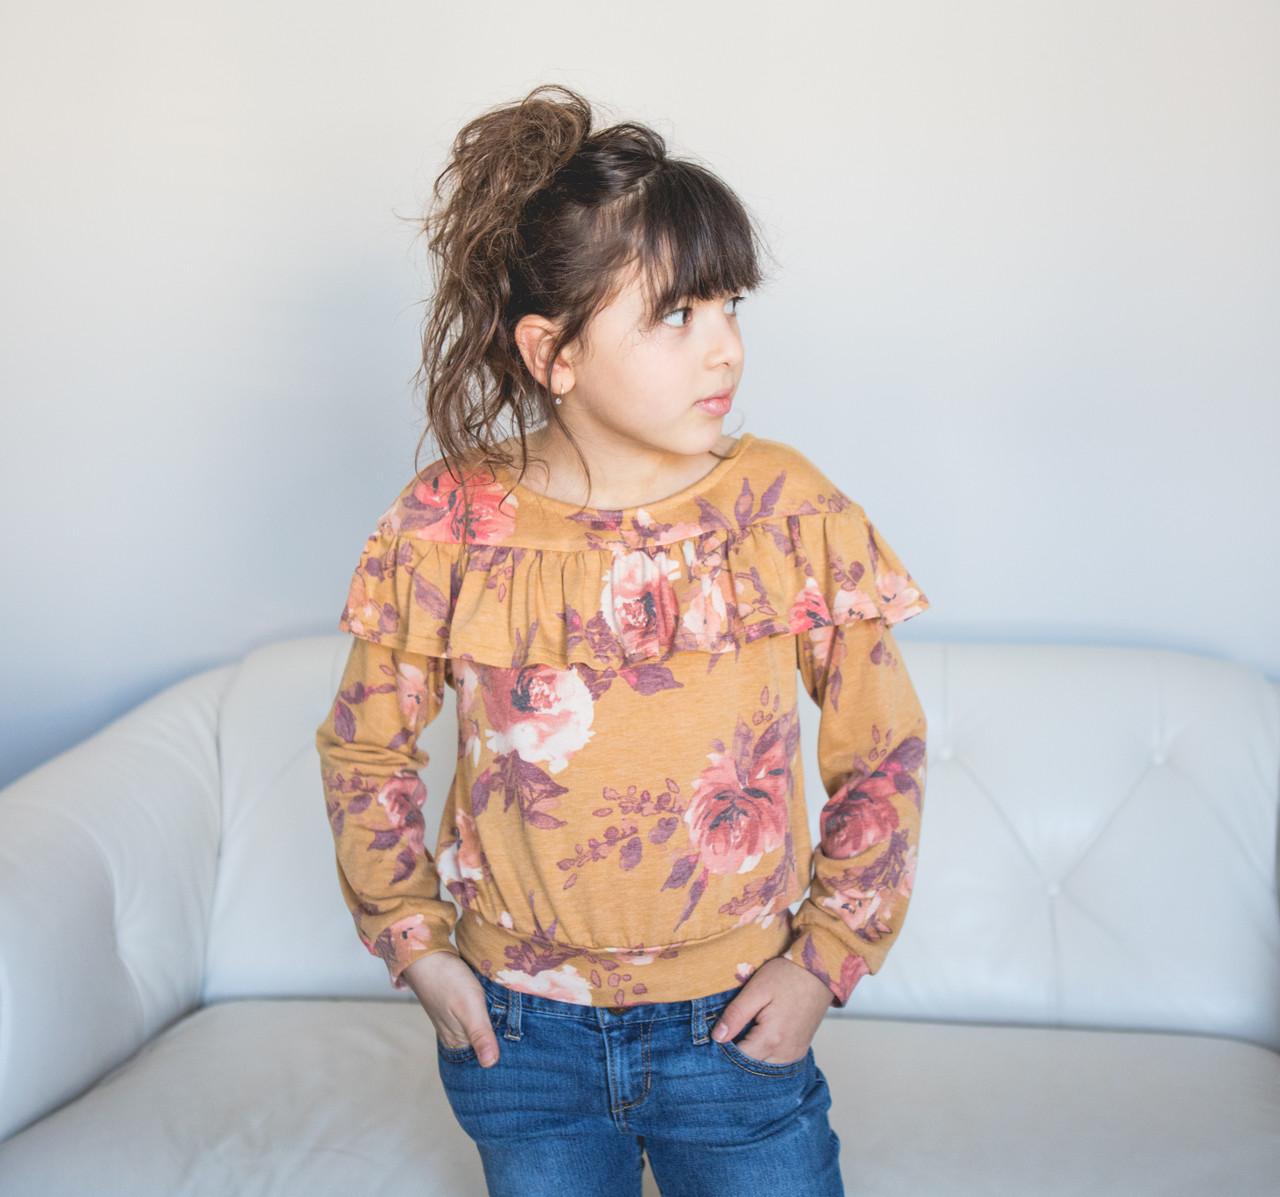 Raven Meet Rhubarb Blog Post/Sofiona Designs